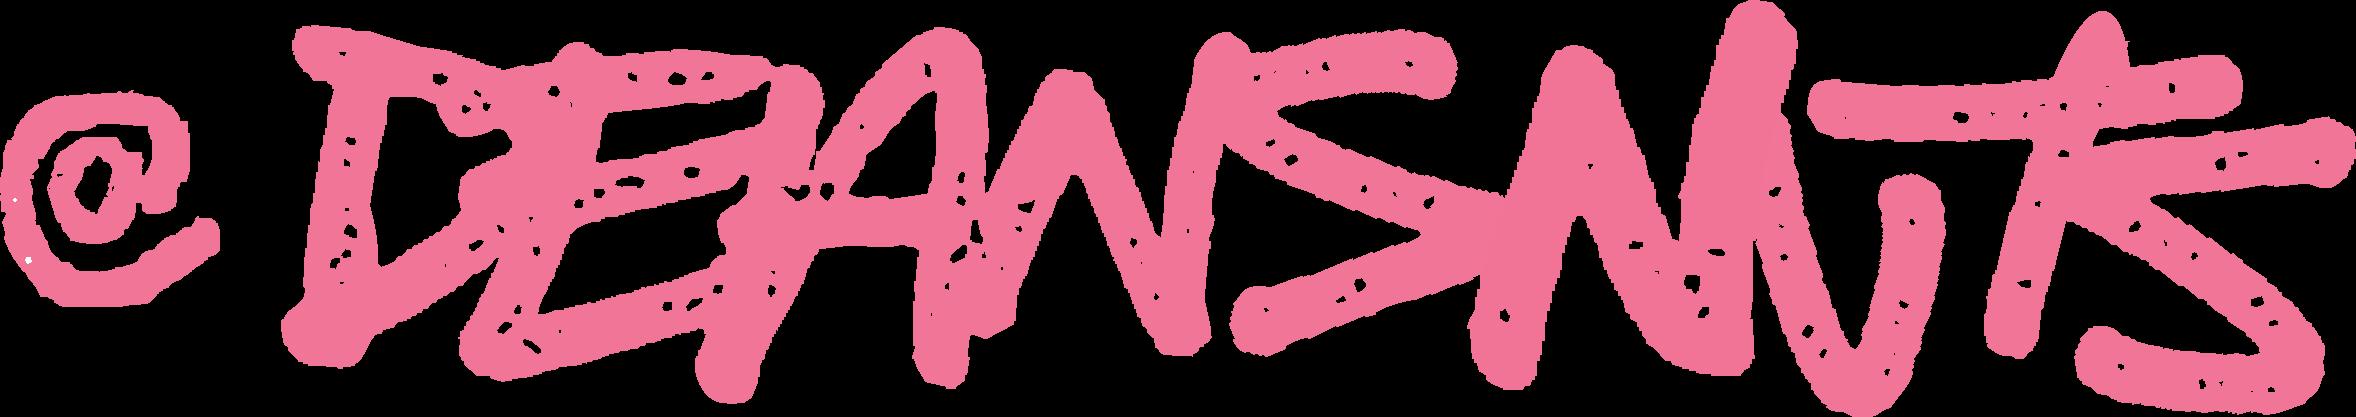 K2xJD_Deansnuts_Logo.png